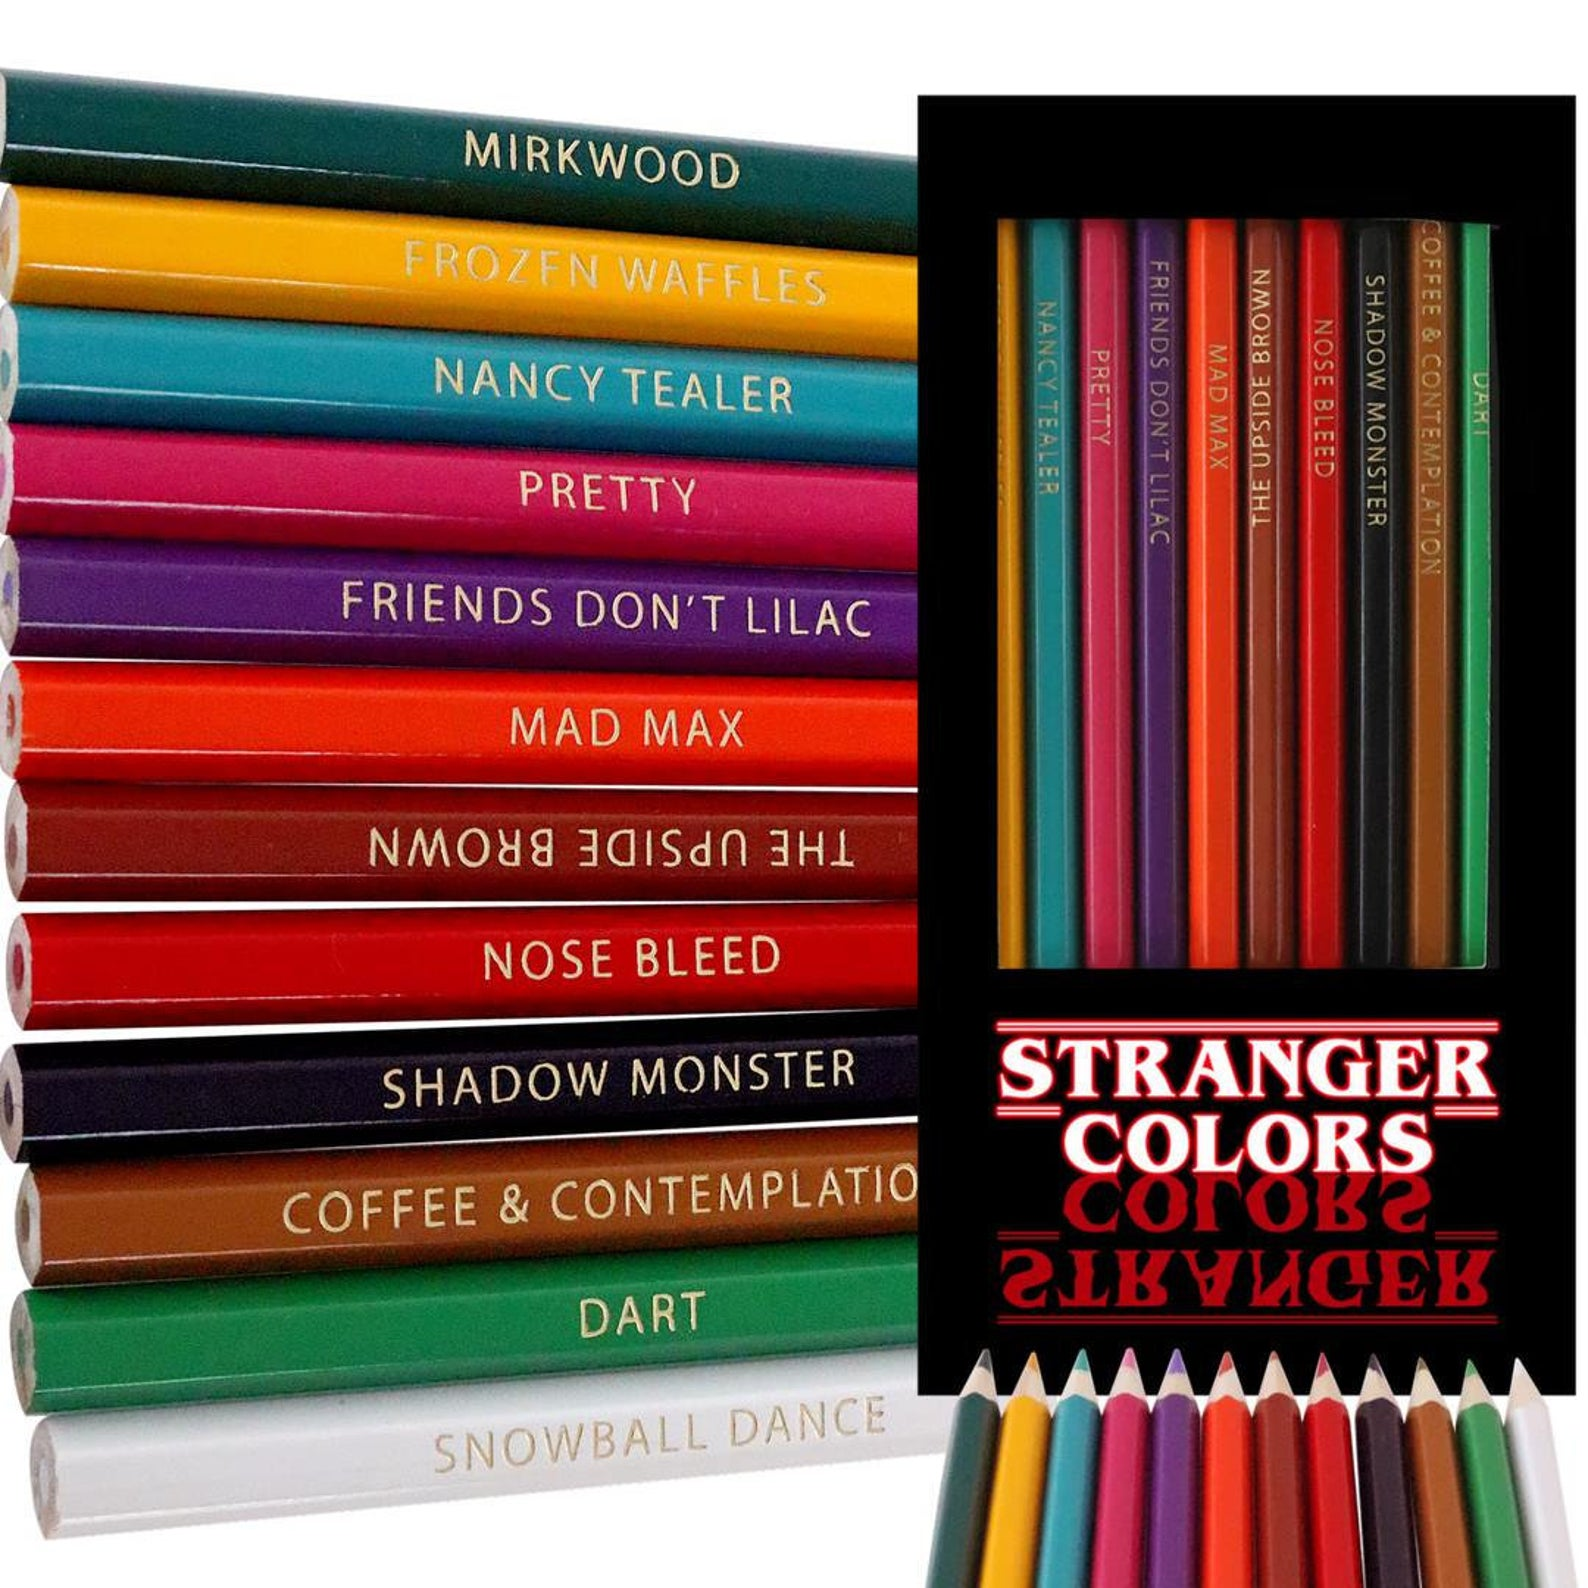 Stranger Things pencil crayons